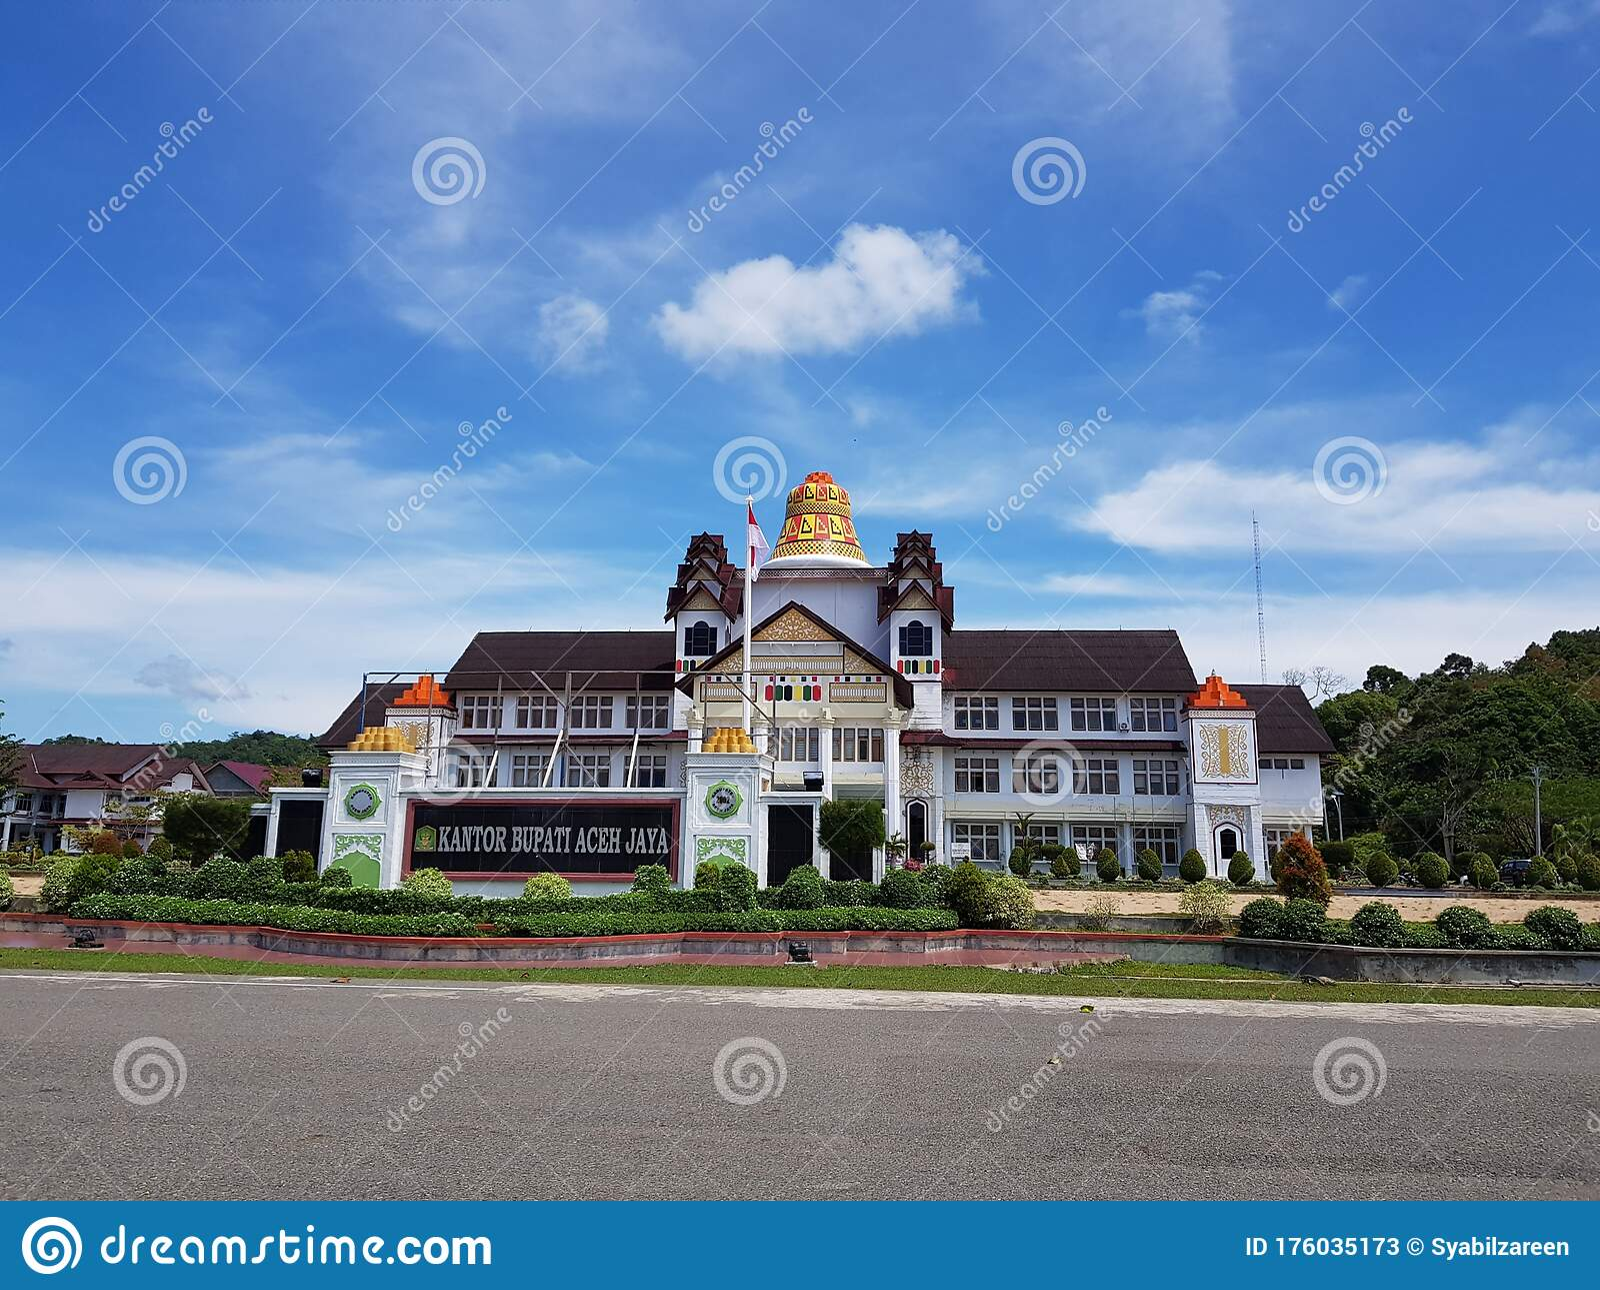 Regent S Office Of Aceh Jaya Stock Image Image Of Holiday Landscape 176035173